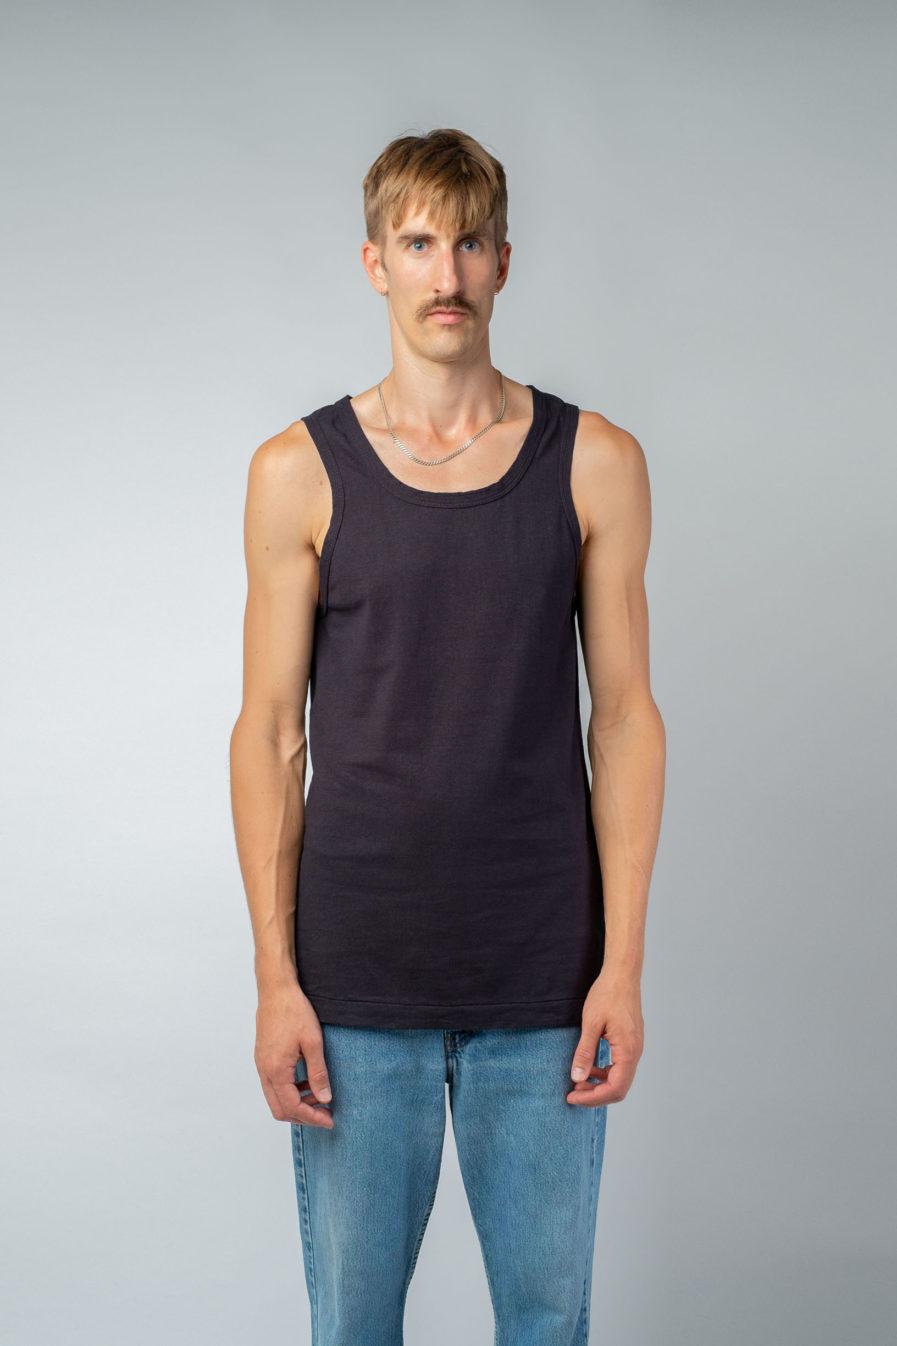 MAN unisex singlet tanktop hemp organic cotton SONNY Carbon black front